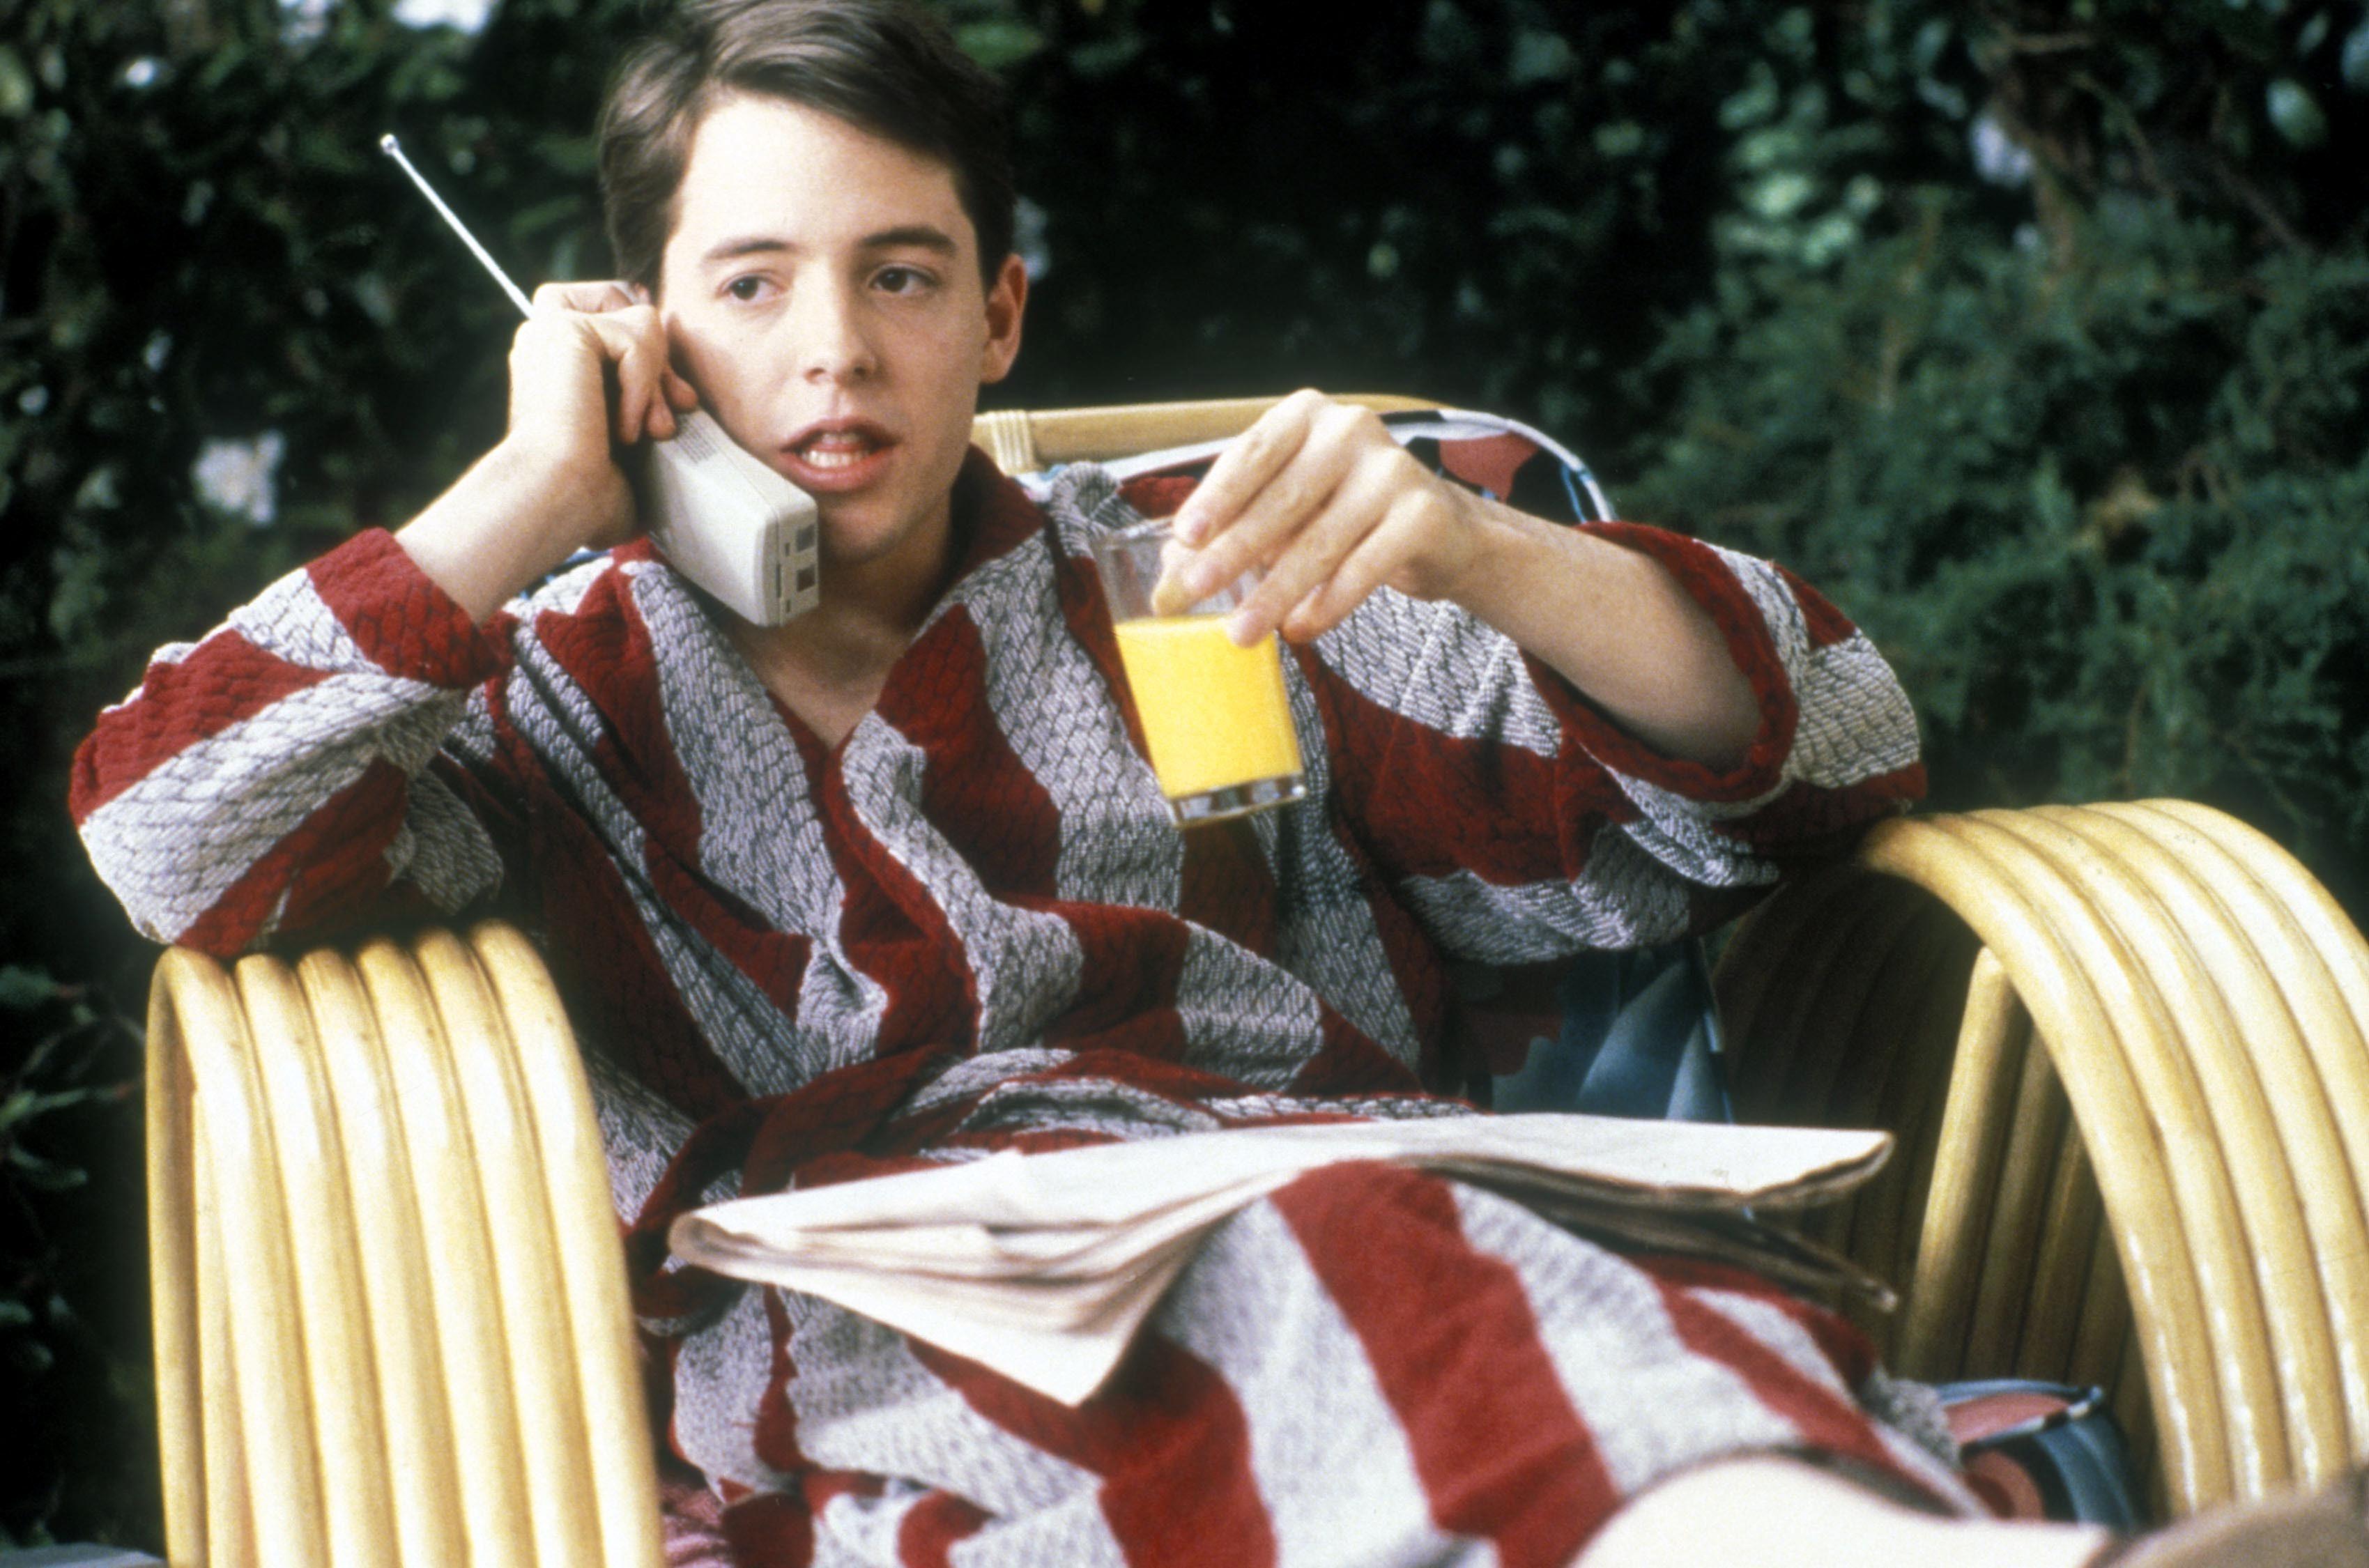 Ferris Bueller's Day Off - 1986